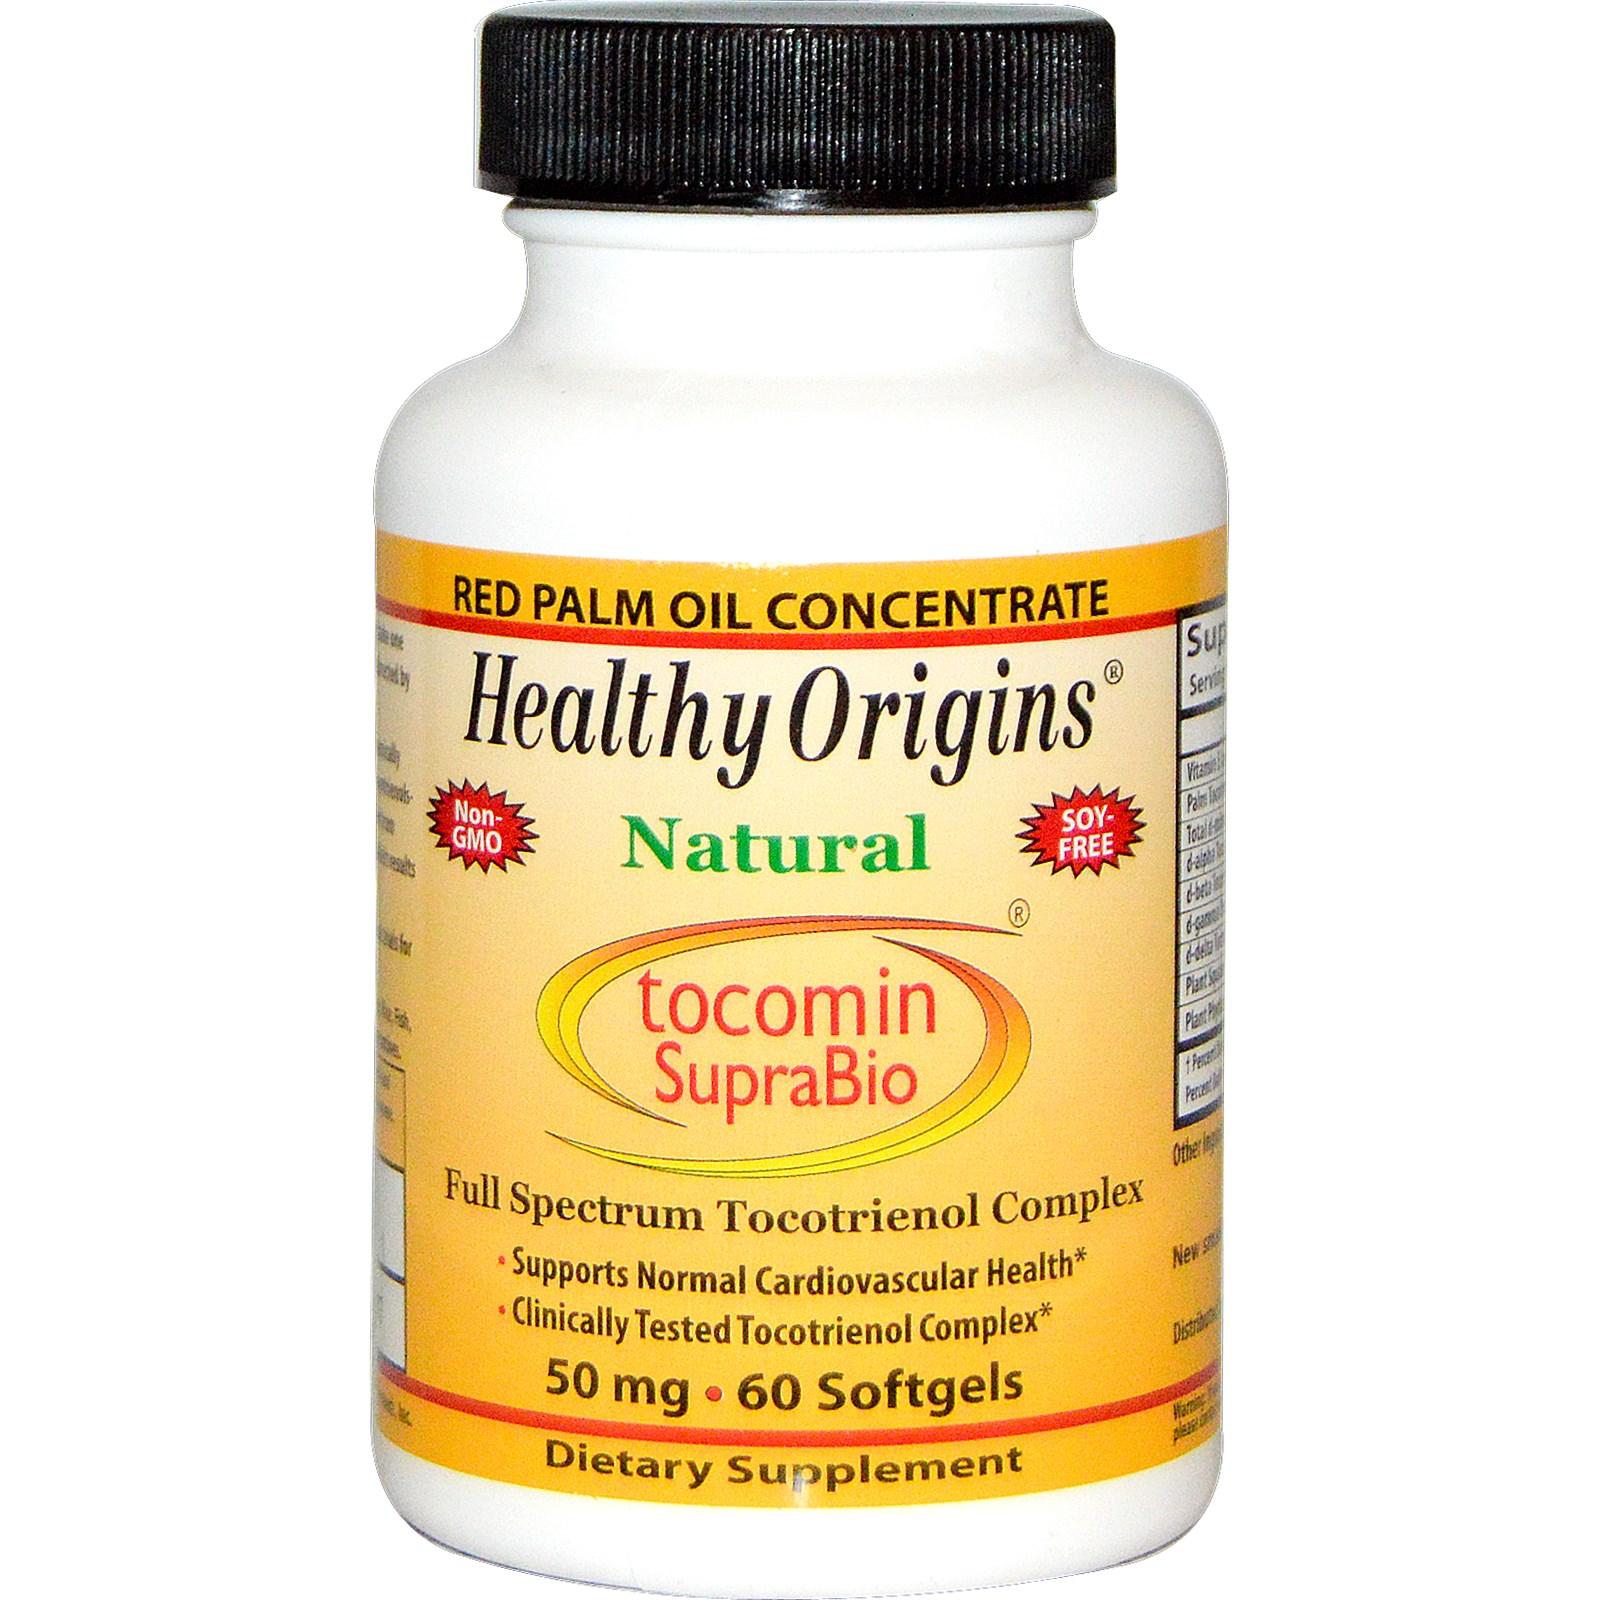 Image of Healthy Origins, Tocomin SupraBio, 50 mg, 60 Softgels 0603573164751